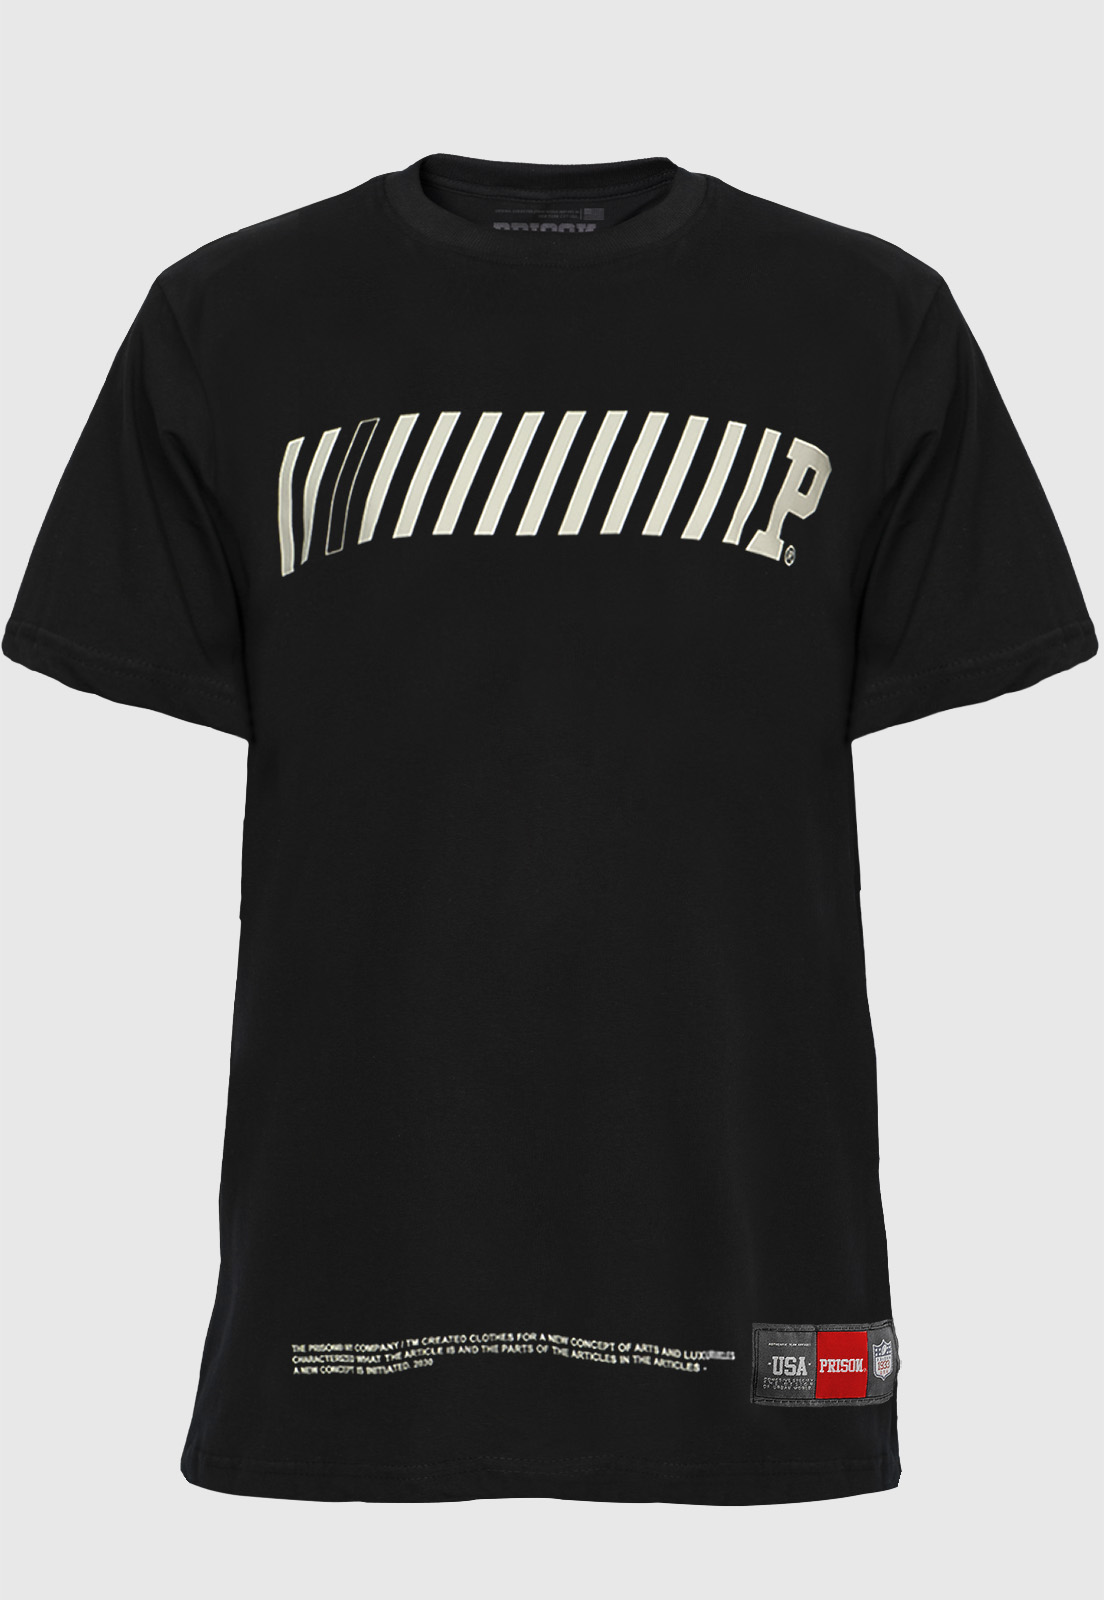 Camiseta Streetwear Prison Code